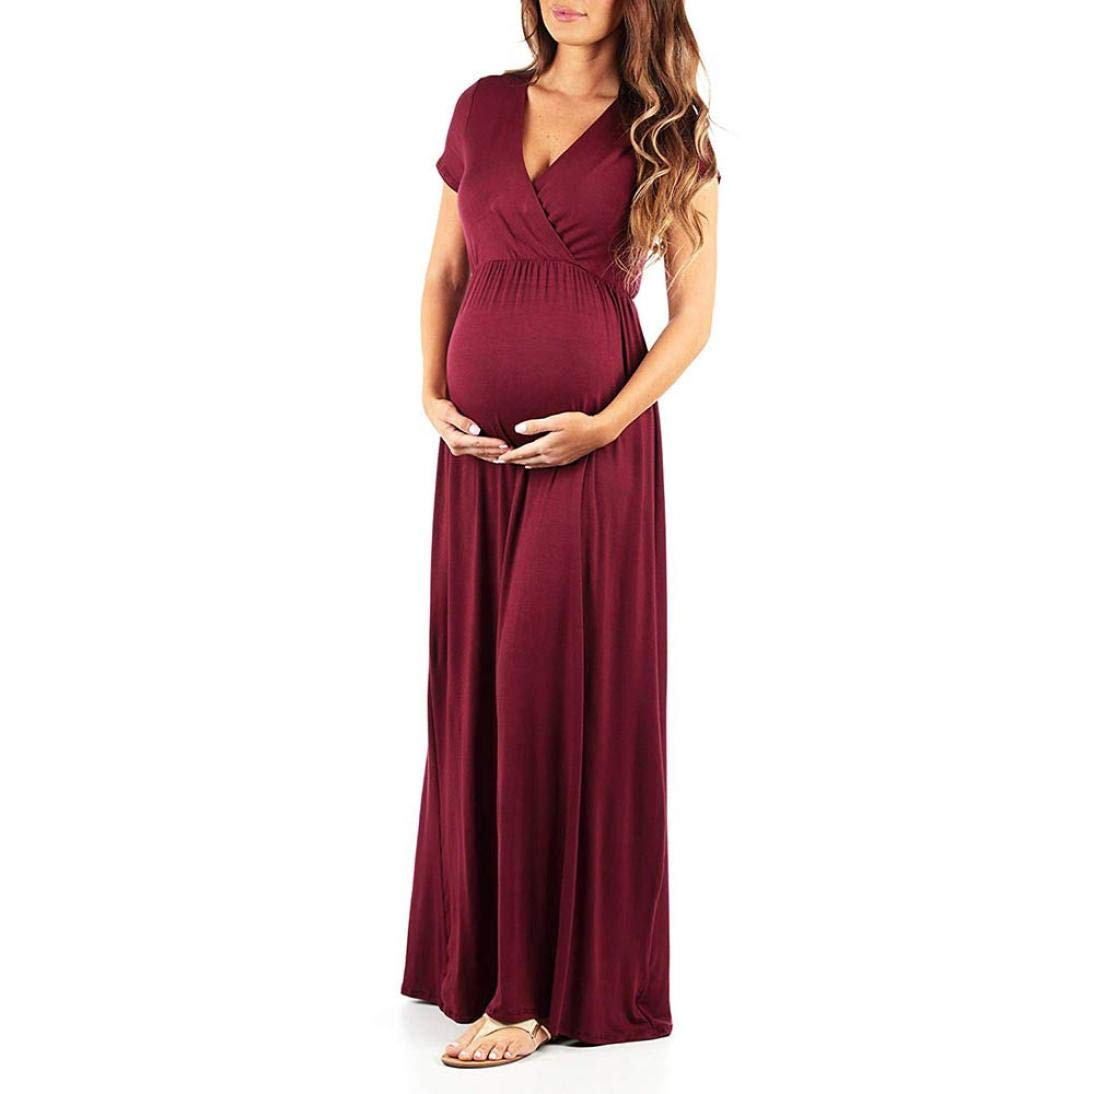 Jushye Clearance!Women's Pregnant Dress,Summer Nursing Solid Maternity Long Maxi Dress (Wine, M)